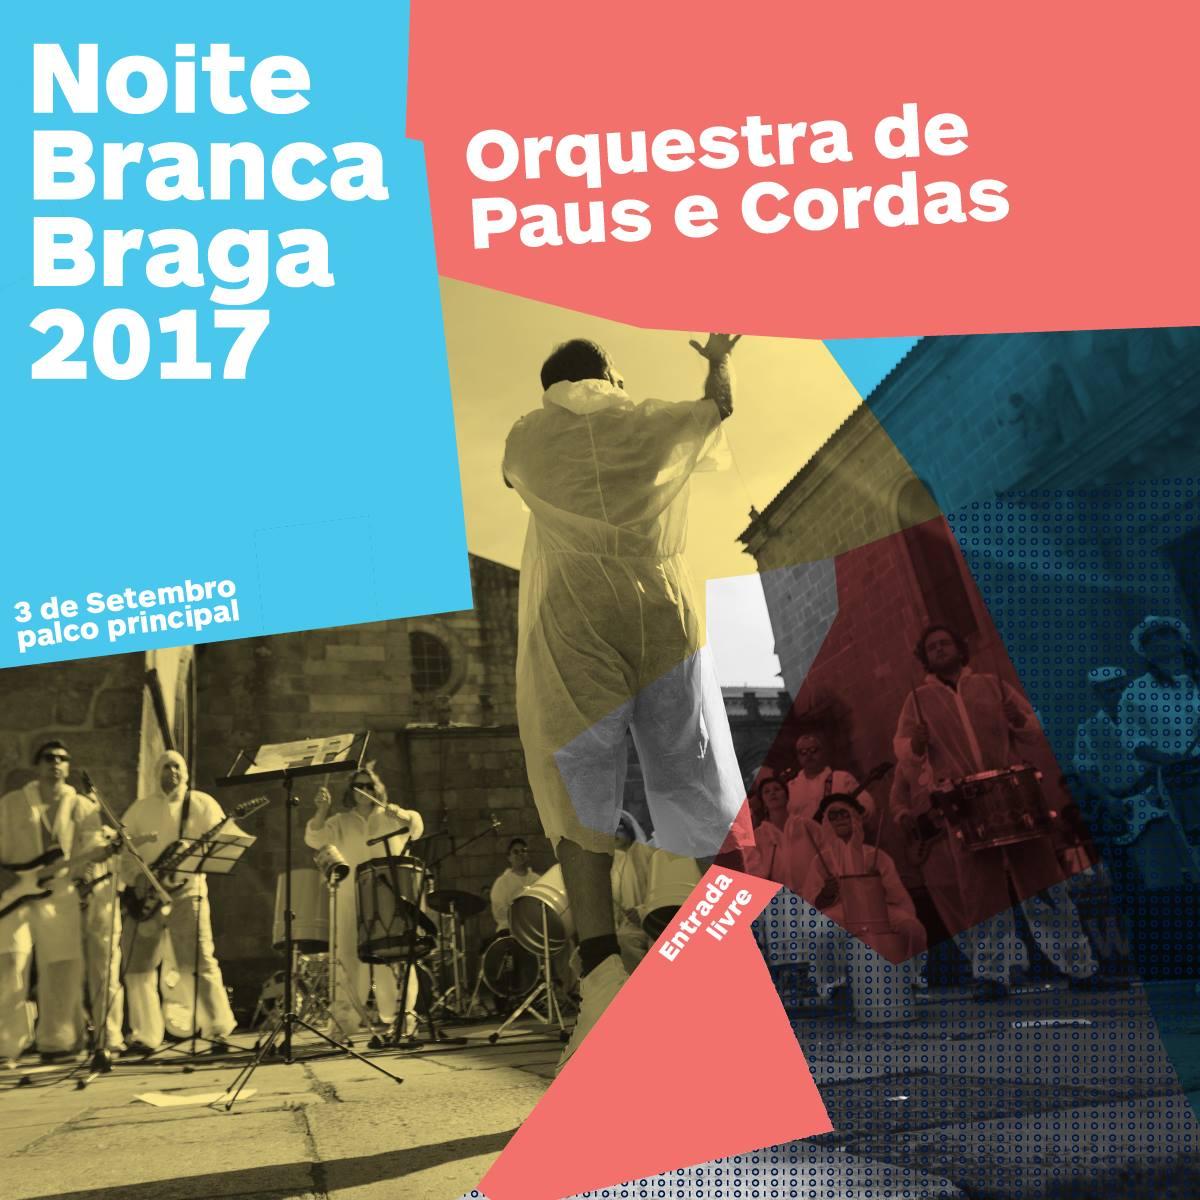 orquestra-de-paus-we-braga-noite-branca